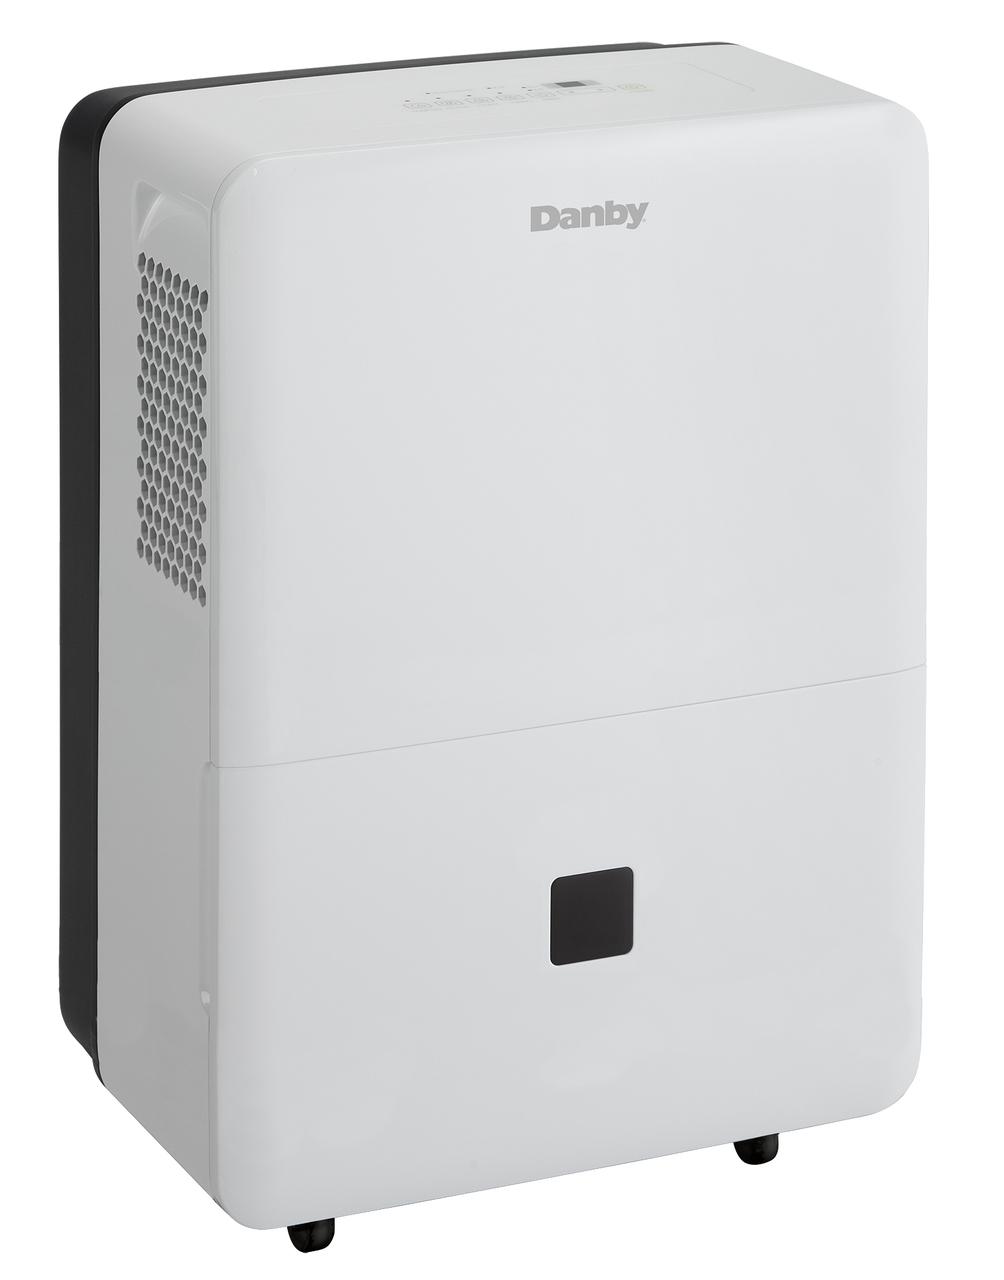 Danby DDR040BJWDB 40 Pint Portable Dehumidifier - Energy Star